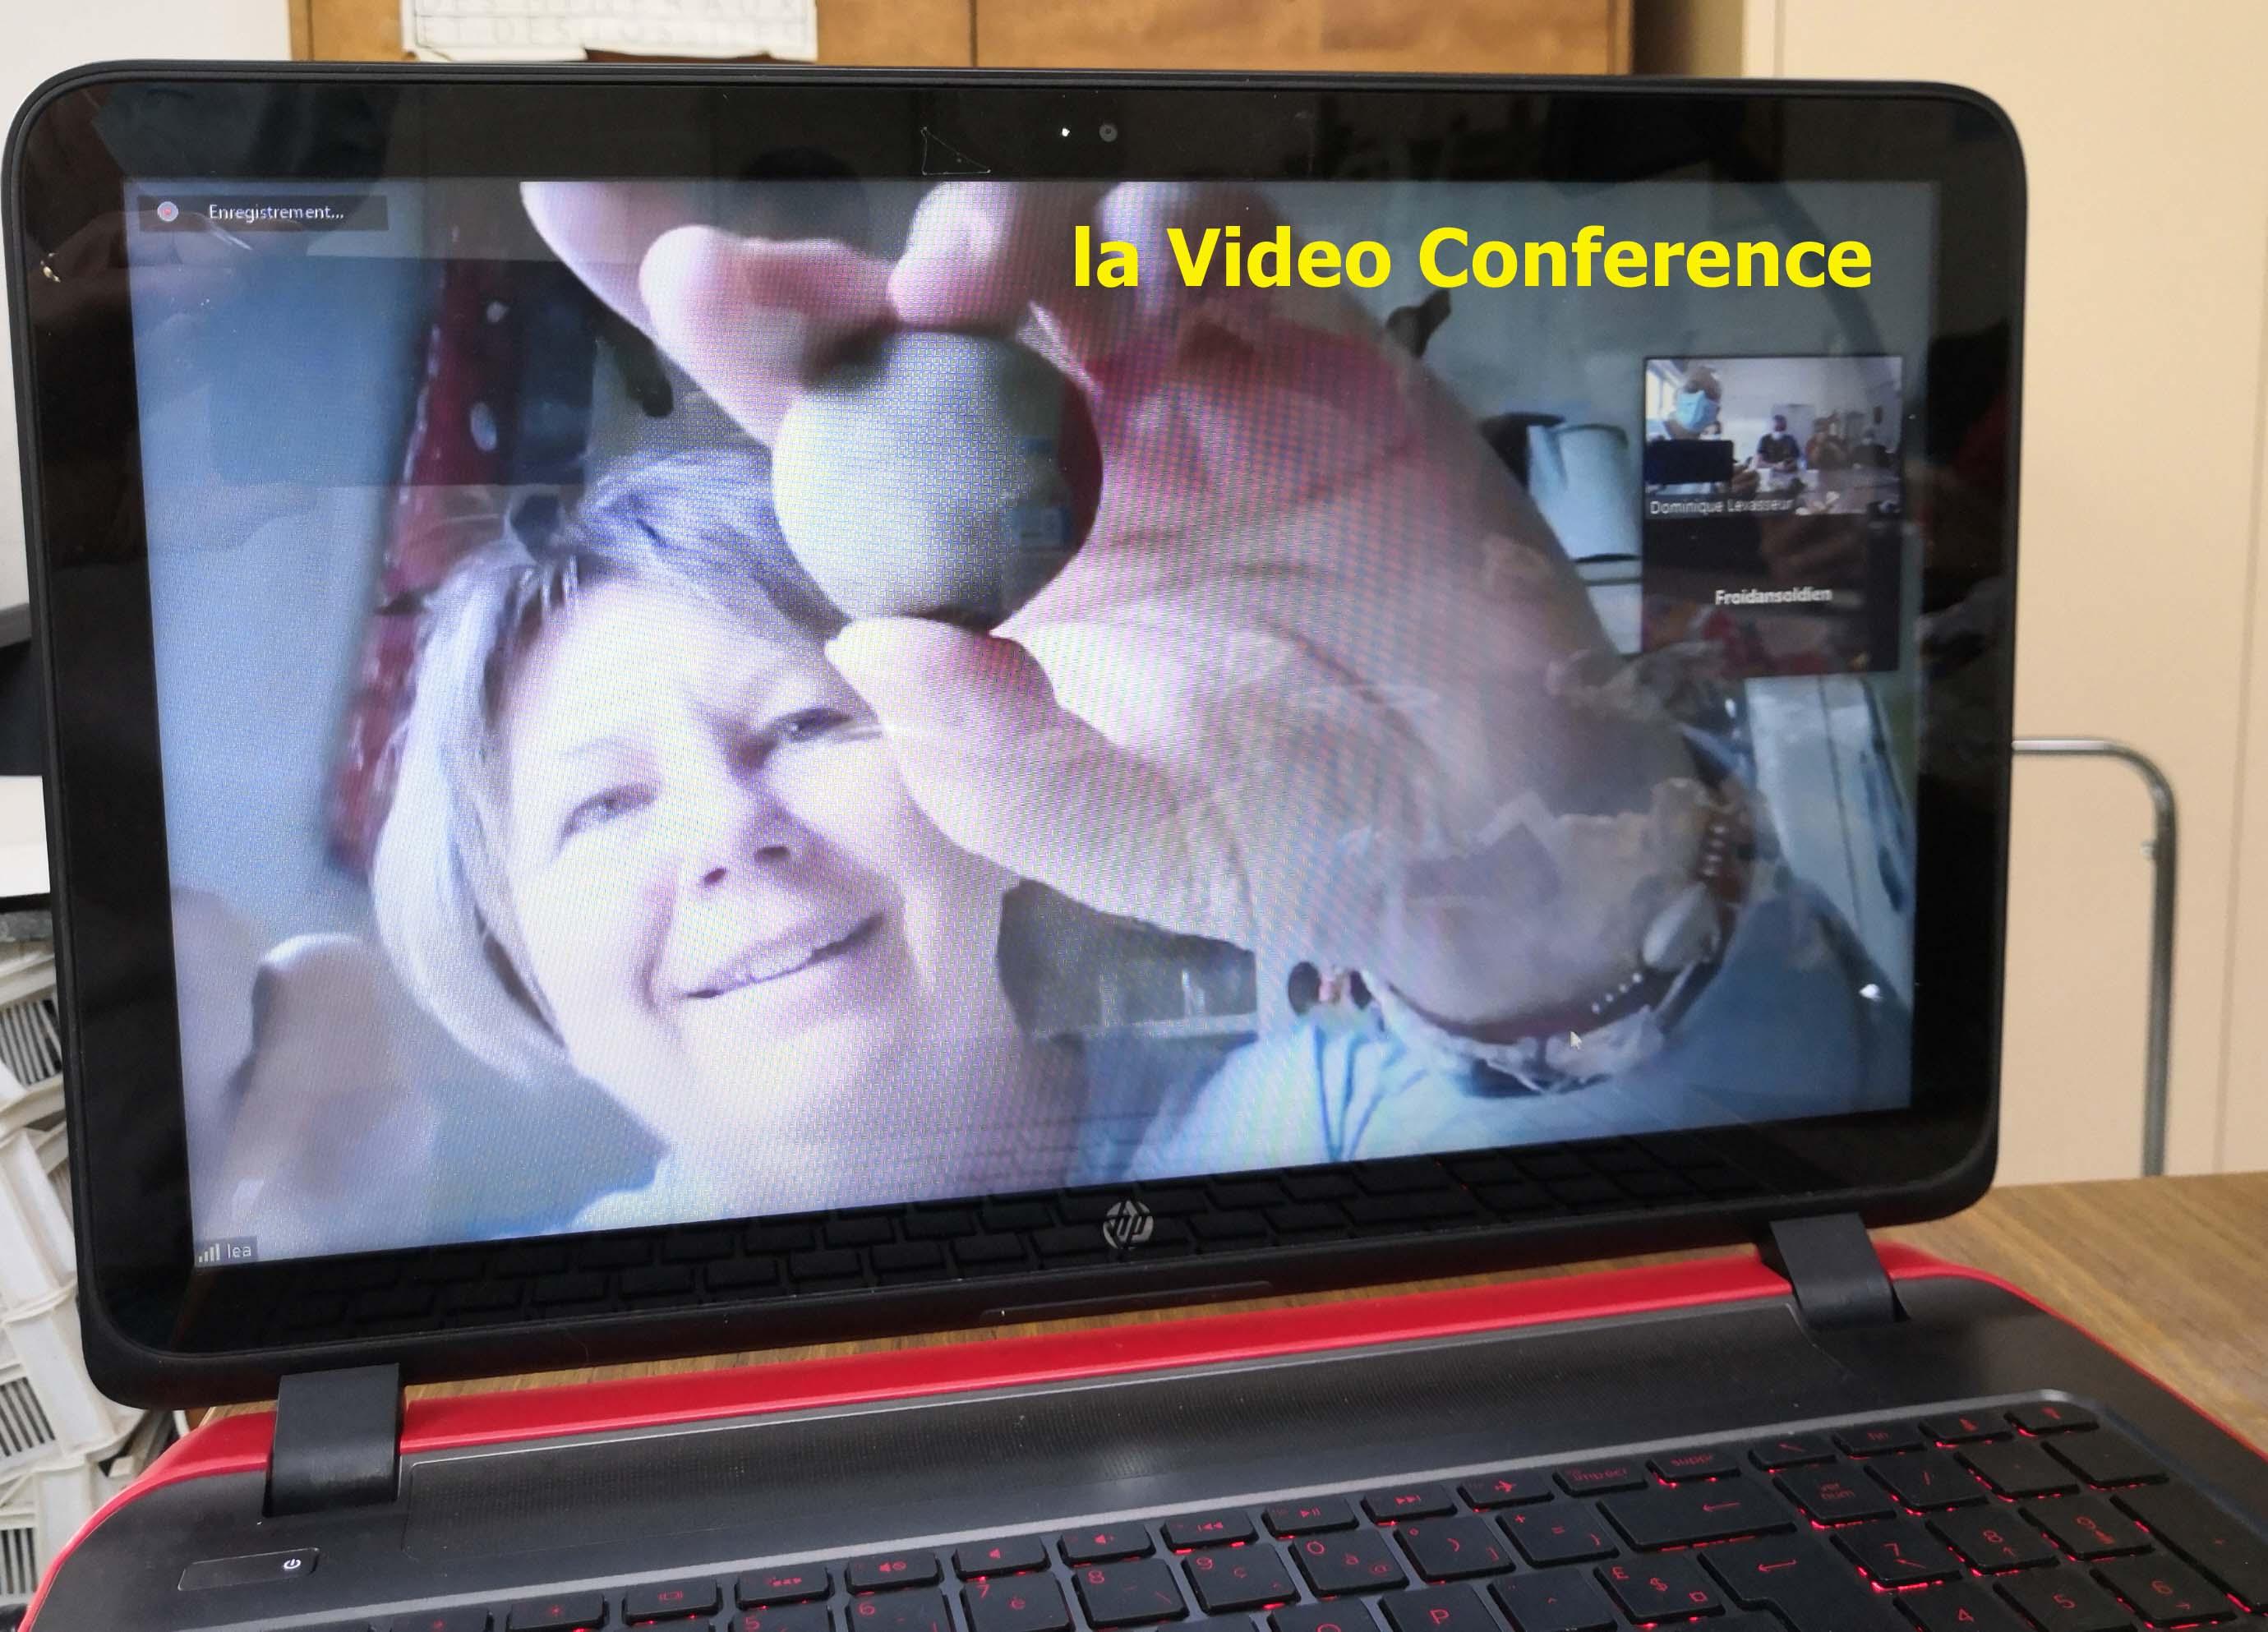 la video conferencer